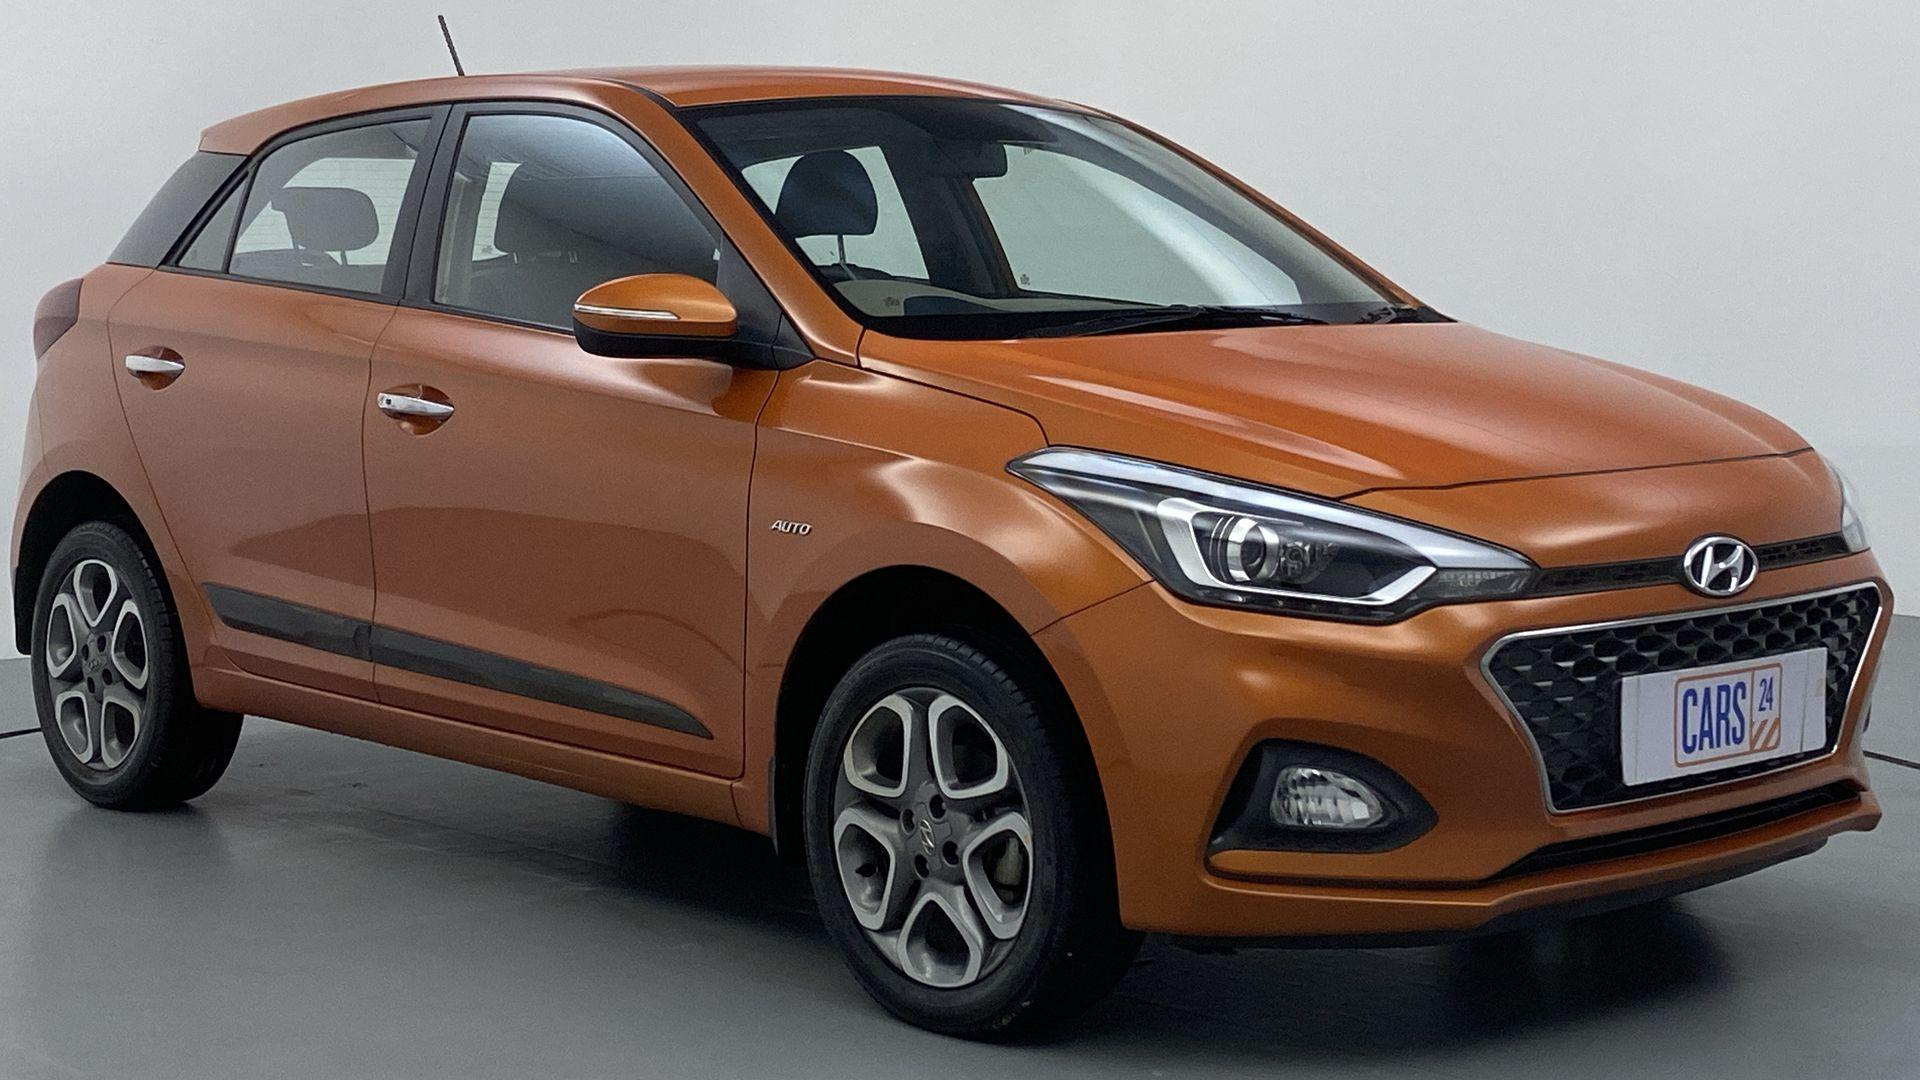 2019 Hyundai Elite i20 1.2  ASTA (O) CVT